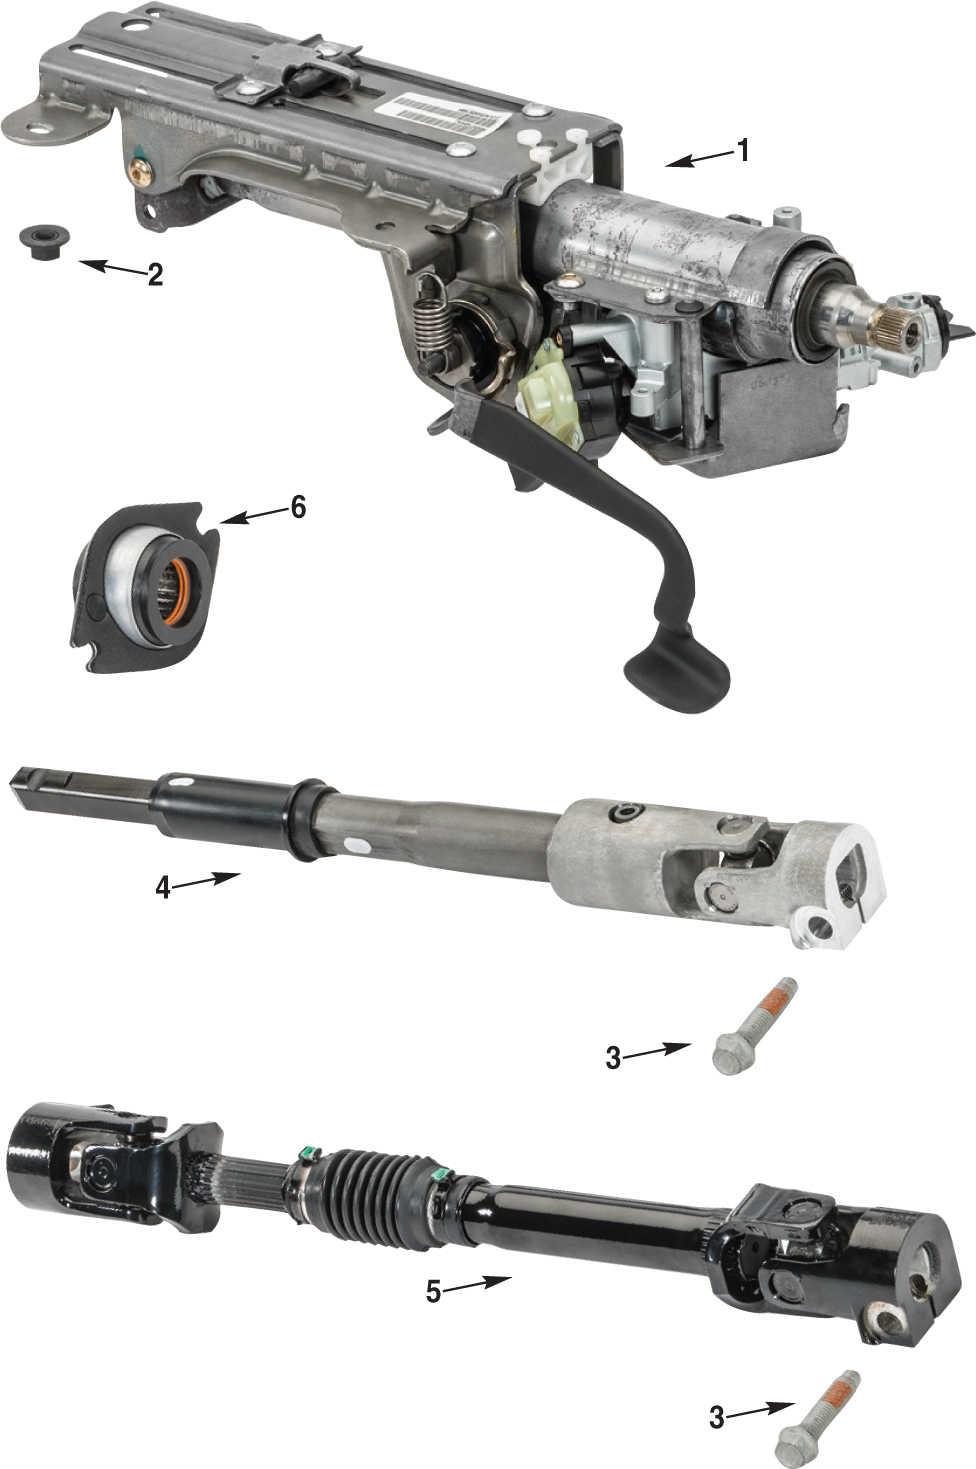 hight resolution of jk wrangler steering column wiring diagram jk free 1990 jeep cherokee steering column wiring diagram 1990